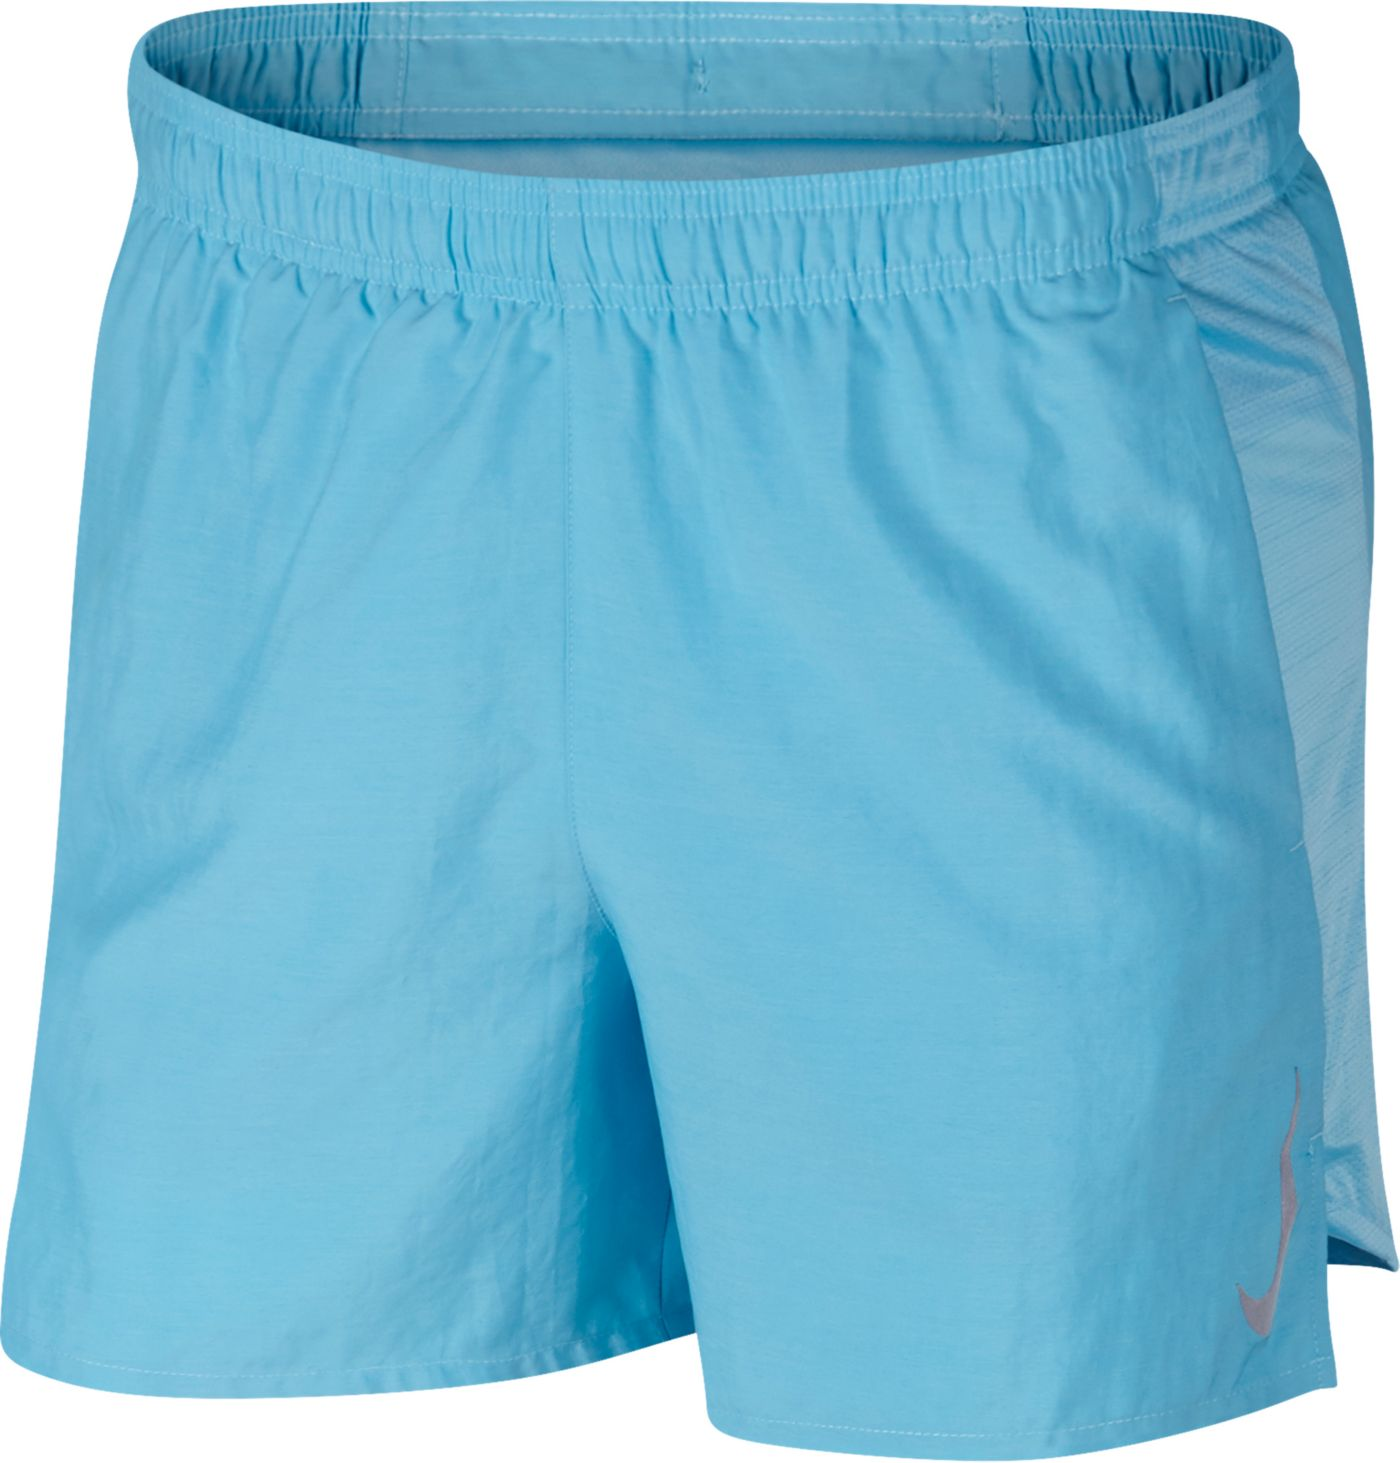 Nike Men's Challenger Dri-FIT 5'' Running Shorts